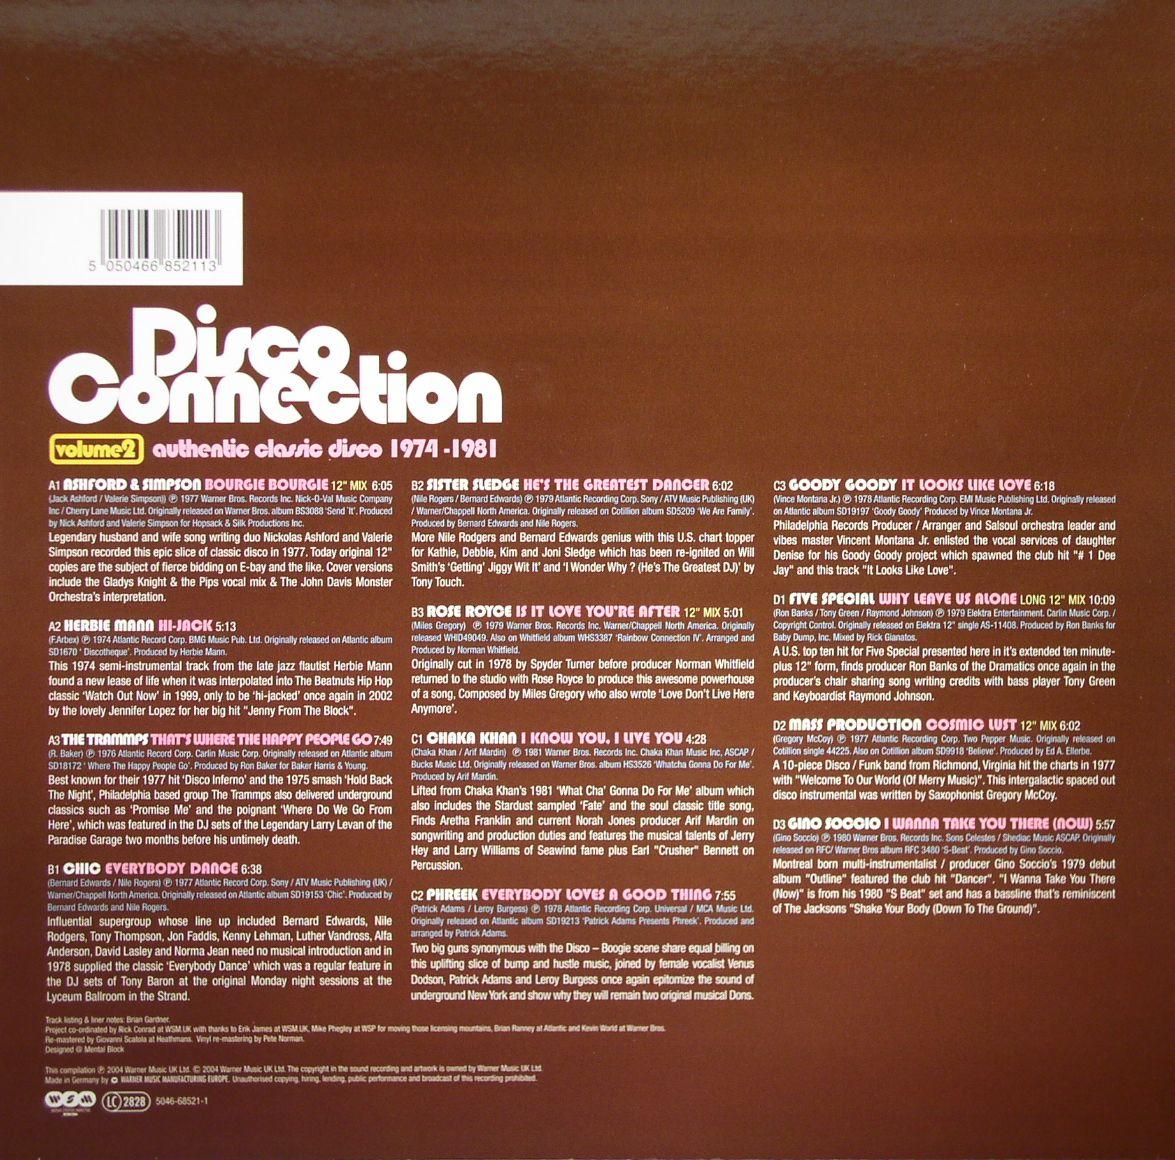 VARIOUS - Disco Connection Volume 2: Authentic Classic Disco 1974-1981